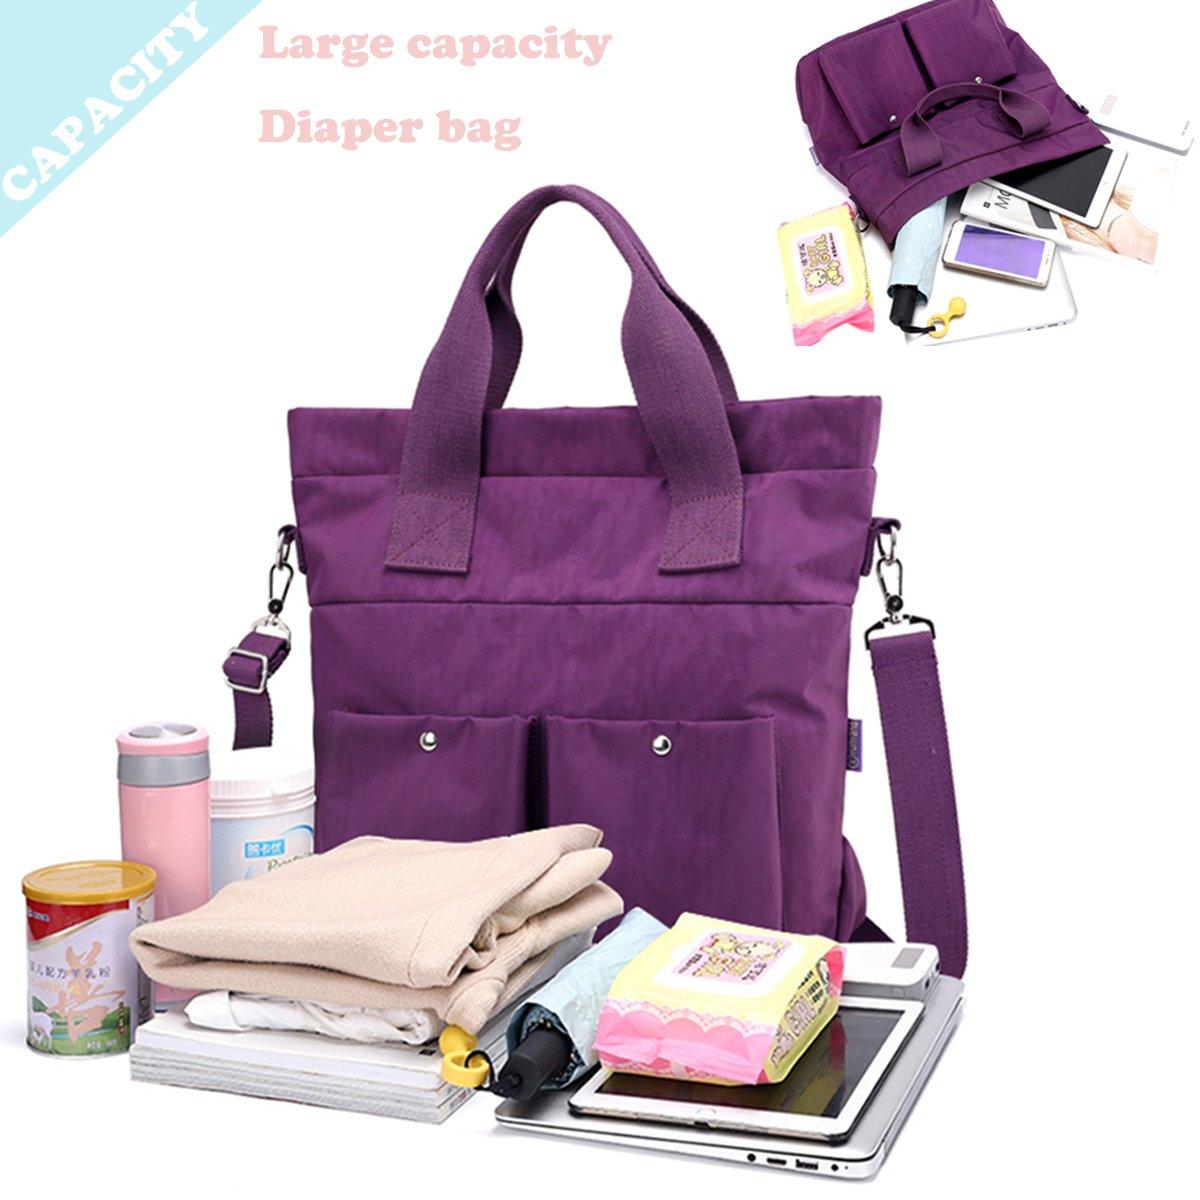 Women Nylon Shoulder Bag Satchel Handbag, Myhozee Water Repellent Travel Work Tote Bag Cross body Bag by Myhozee (Image #5)